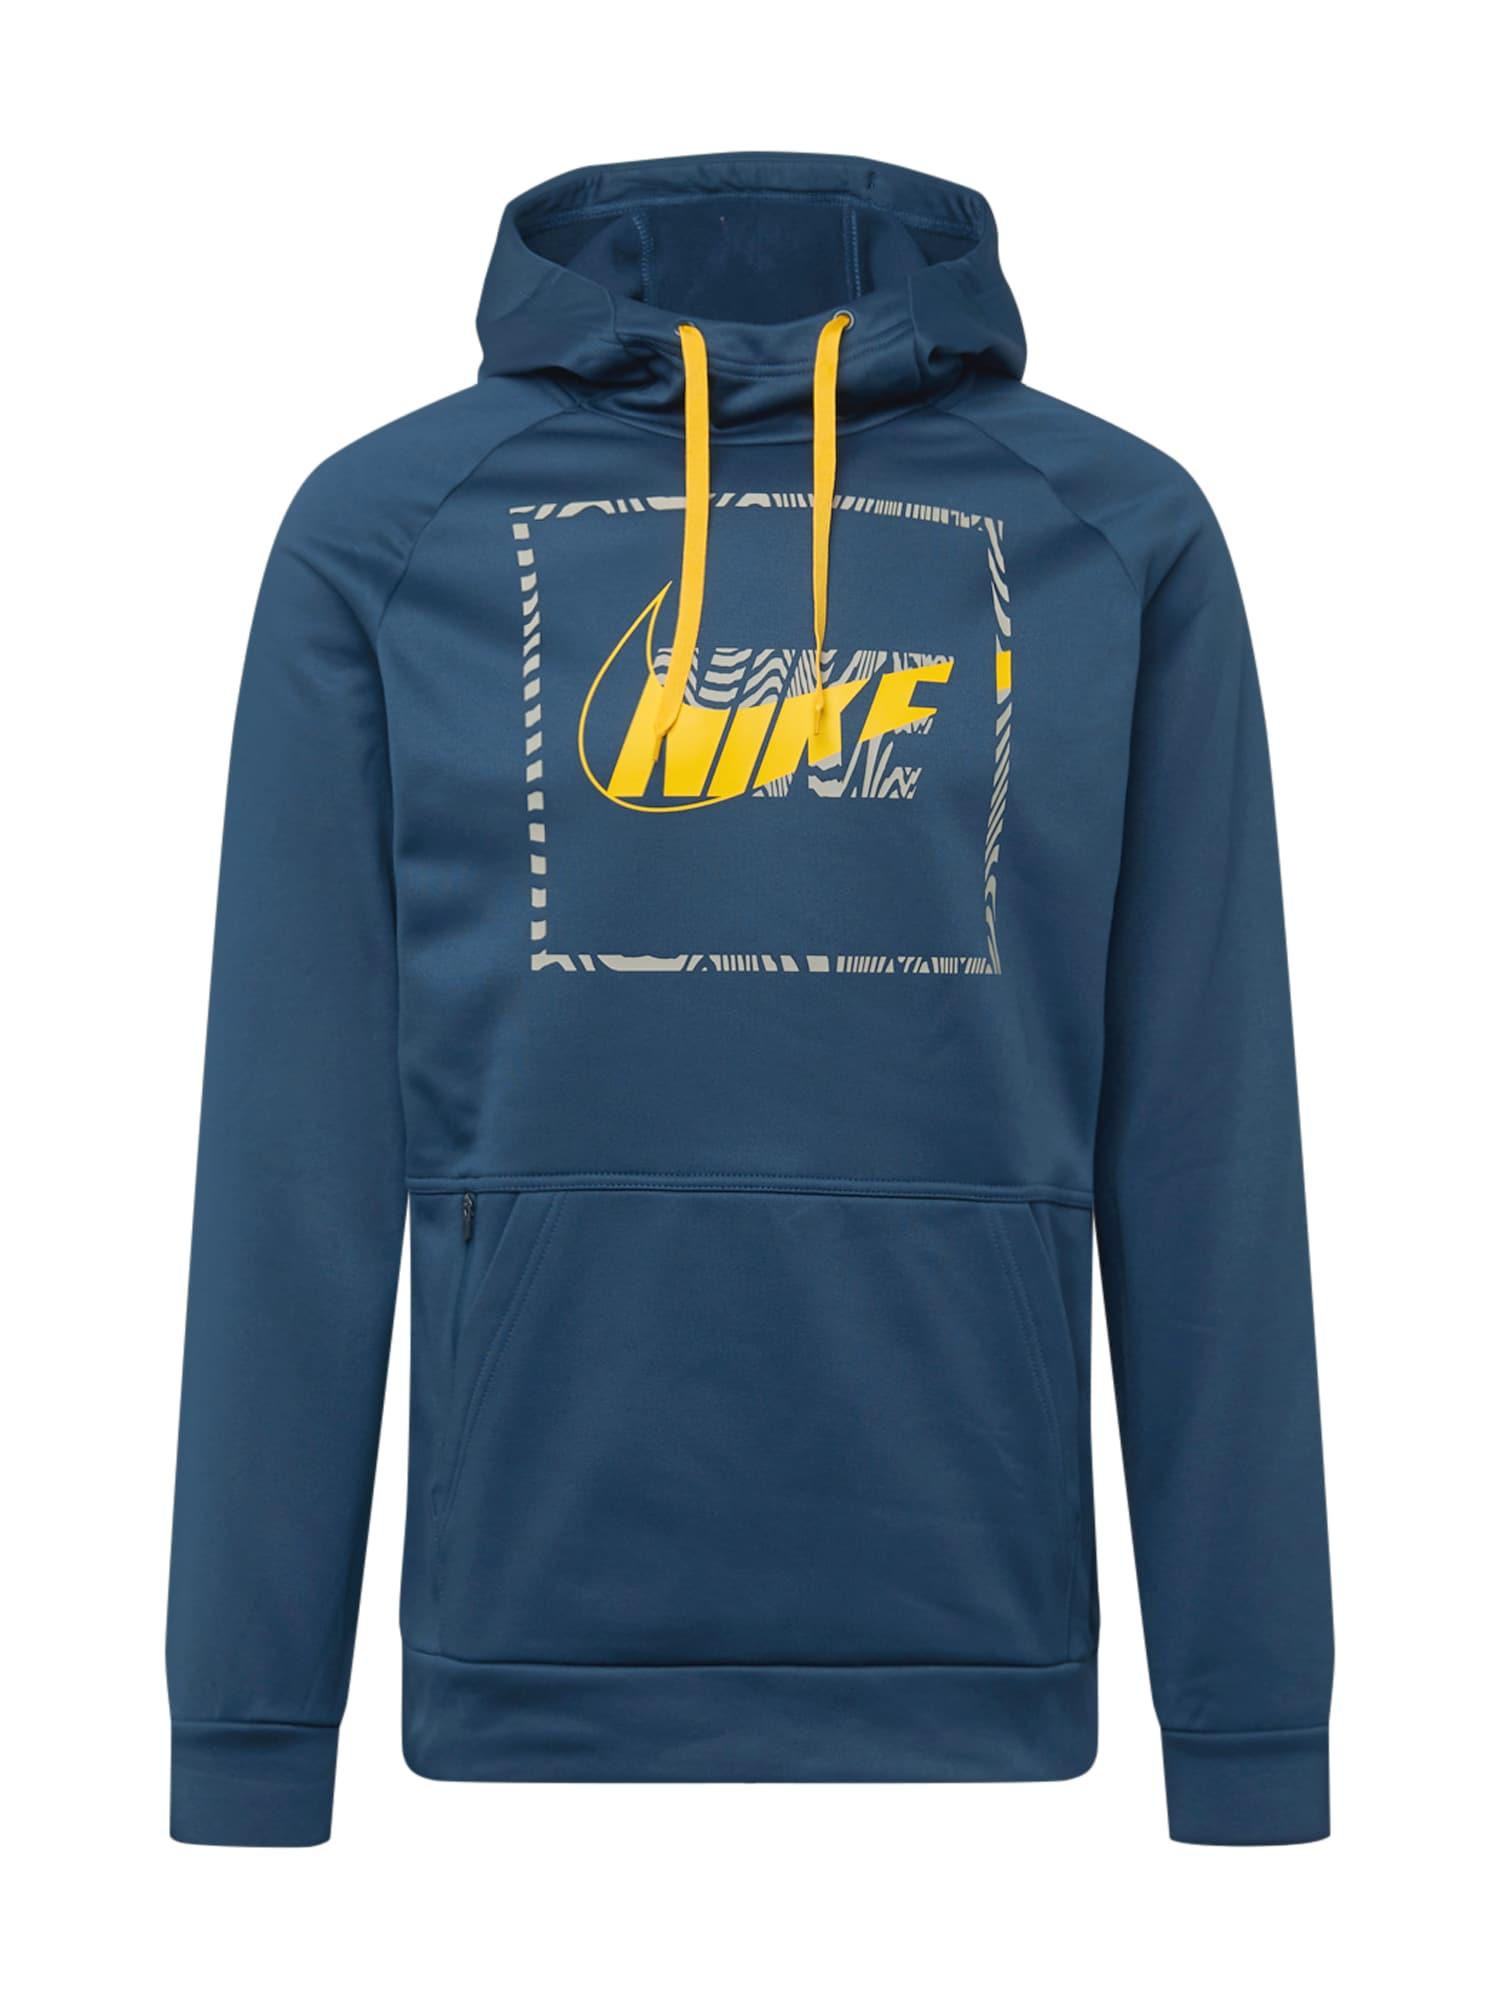 NIKE Sportinio tipo megztinis geltona / tamsiai mėlyna